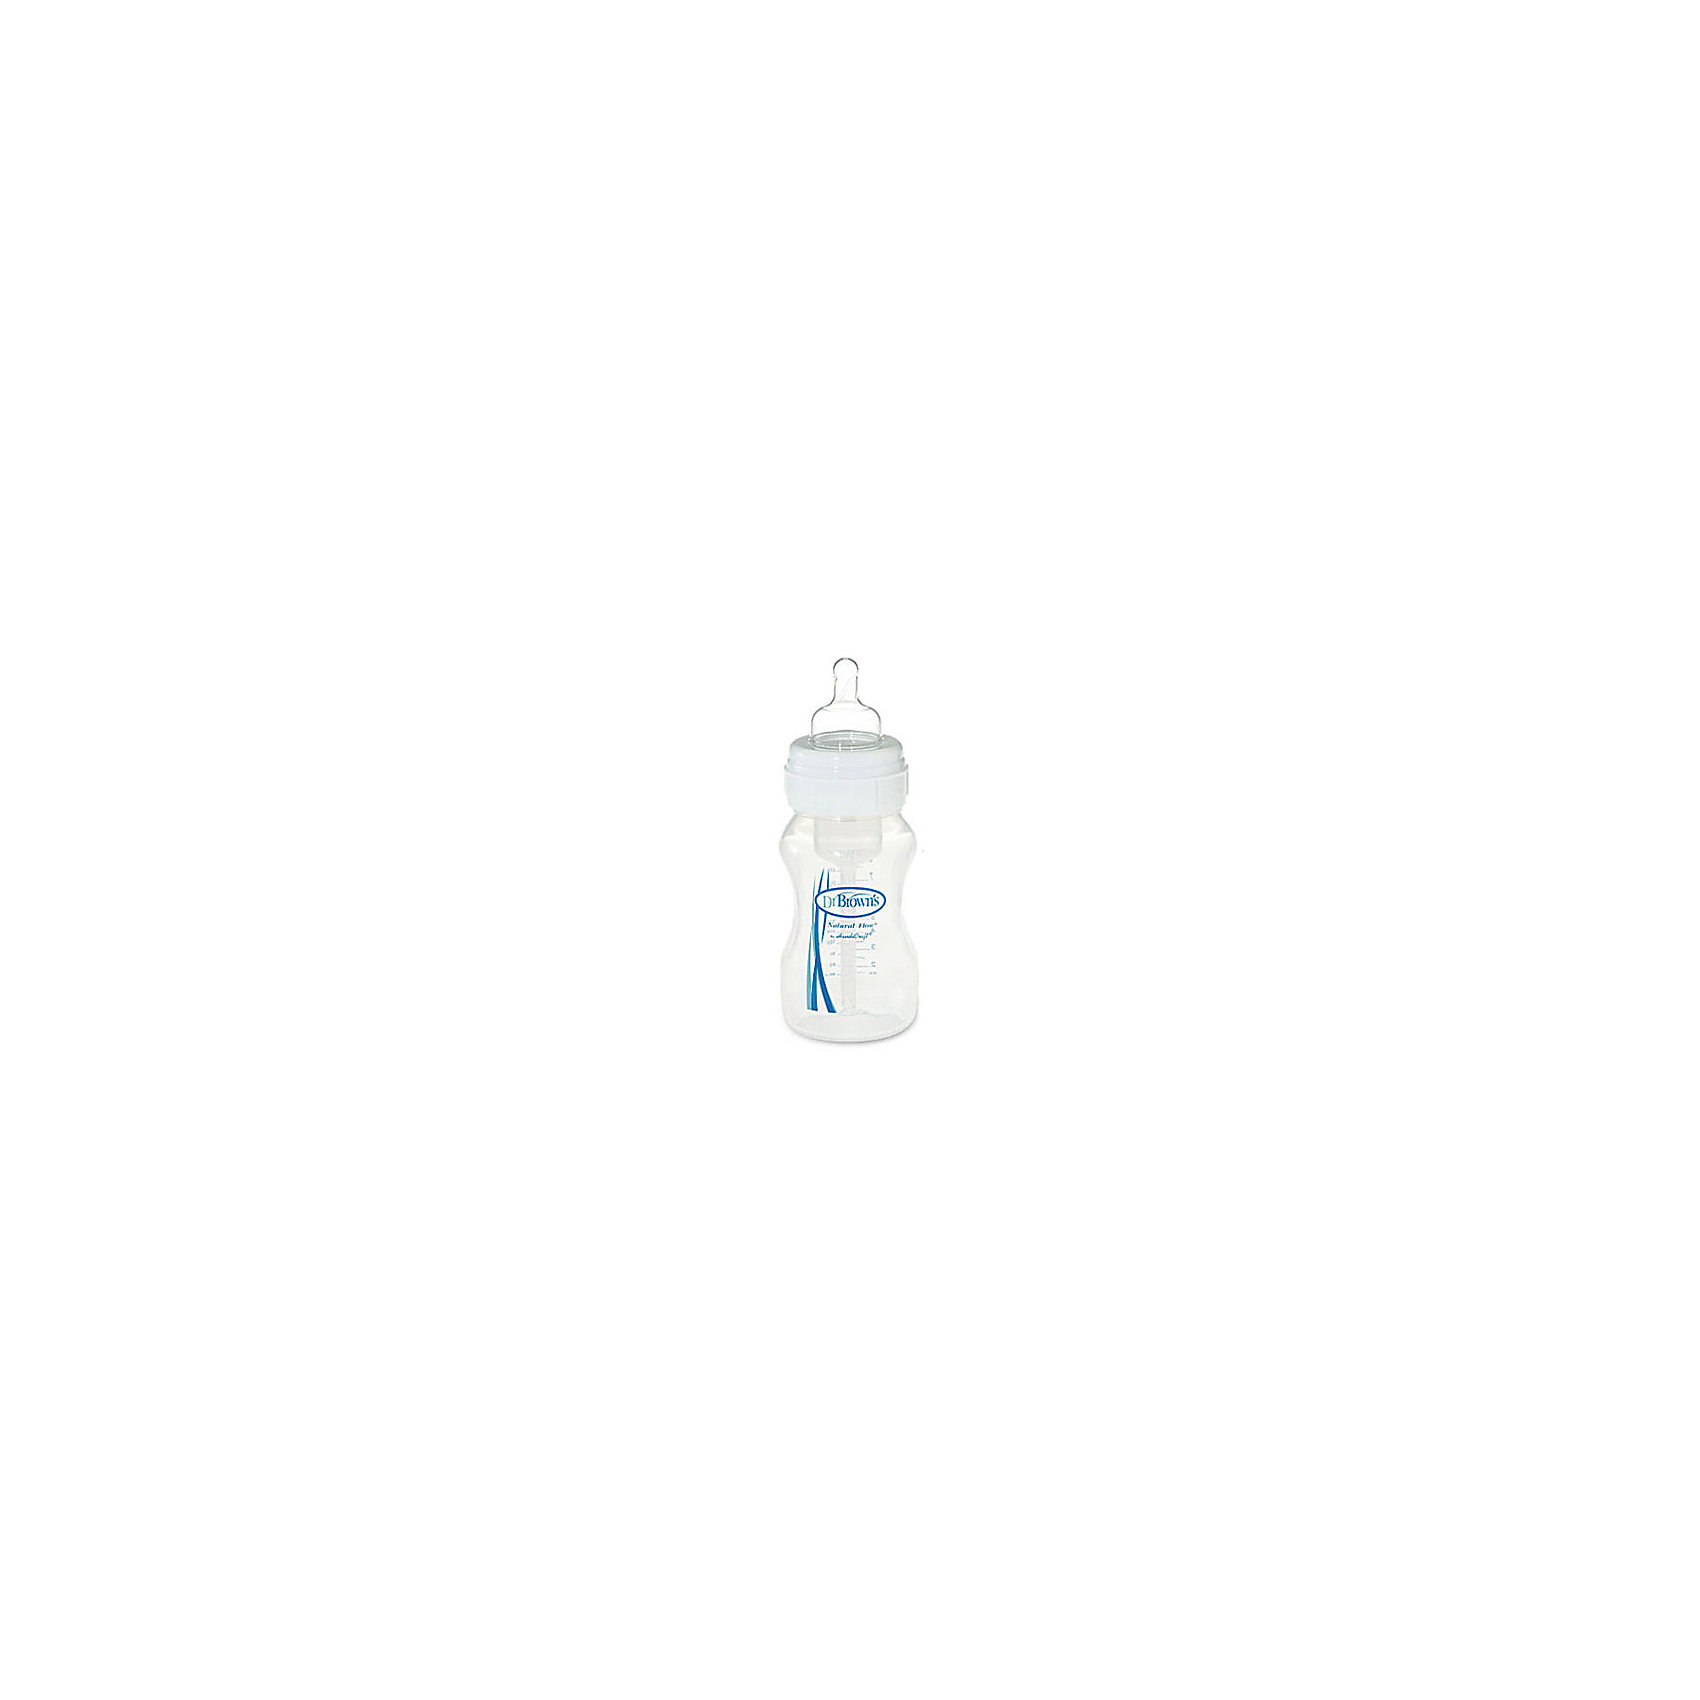 Бутылочка с широким горлышком 300 мл, полипропилен, Dr. Brown (Dr.Browns)